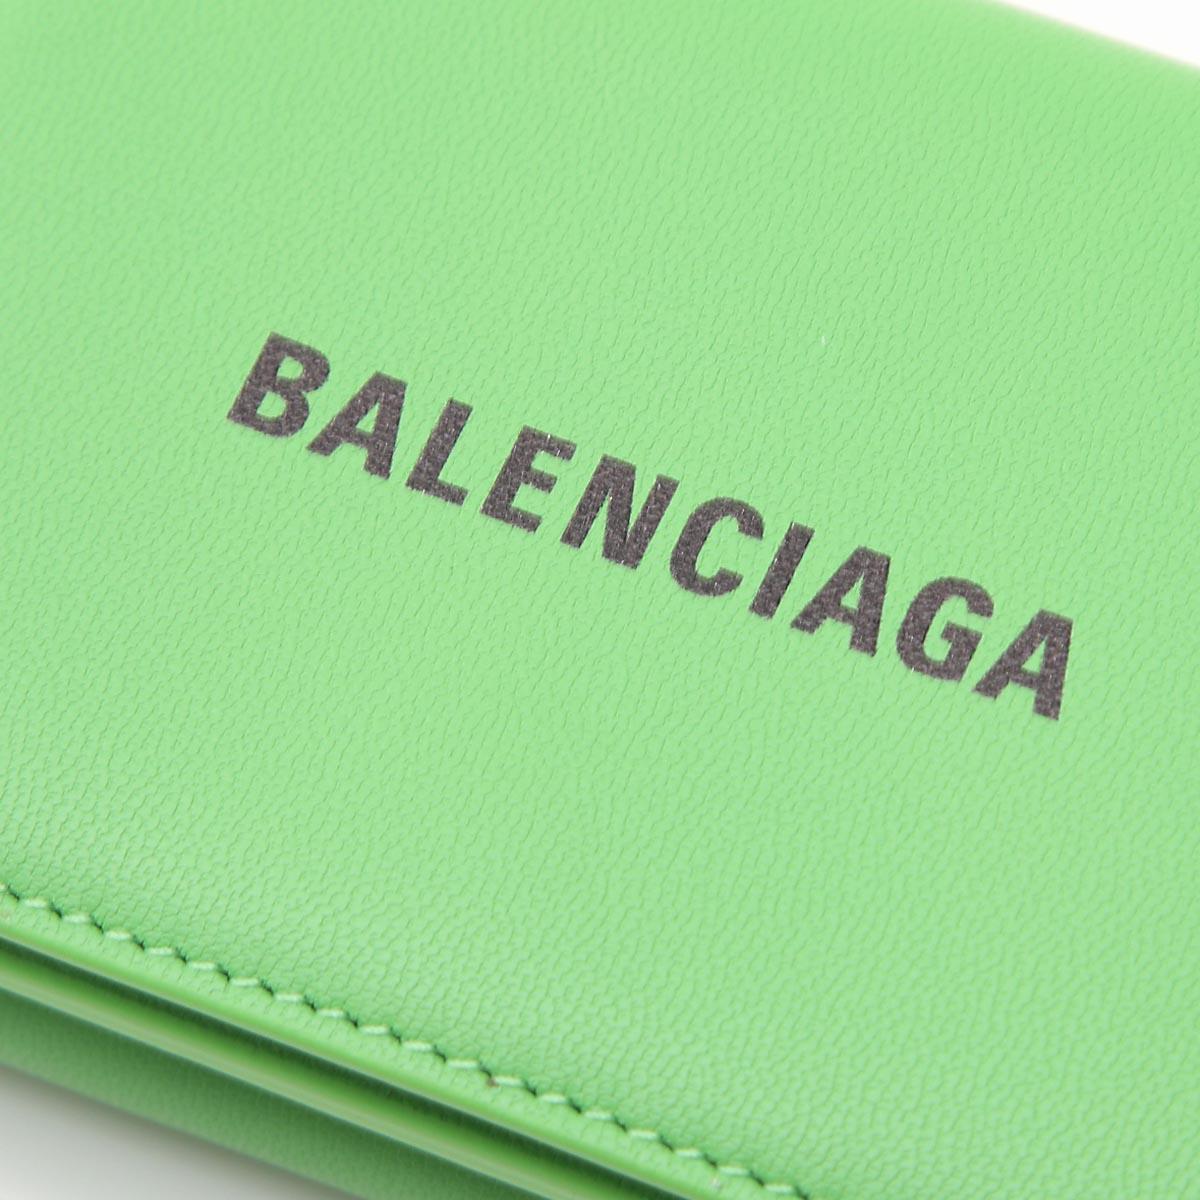 BALENCIAGA バレンシアガ 3つ折り財布 小銭入れ付き/CASH MINI WALLET メンズ